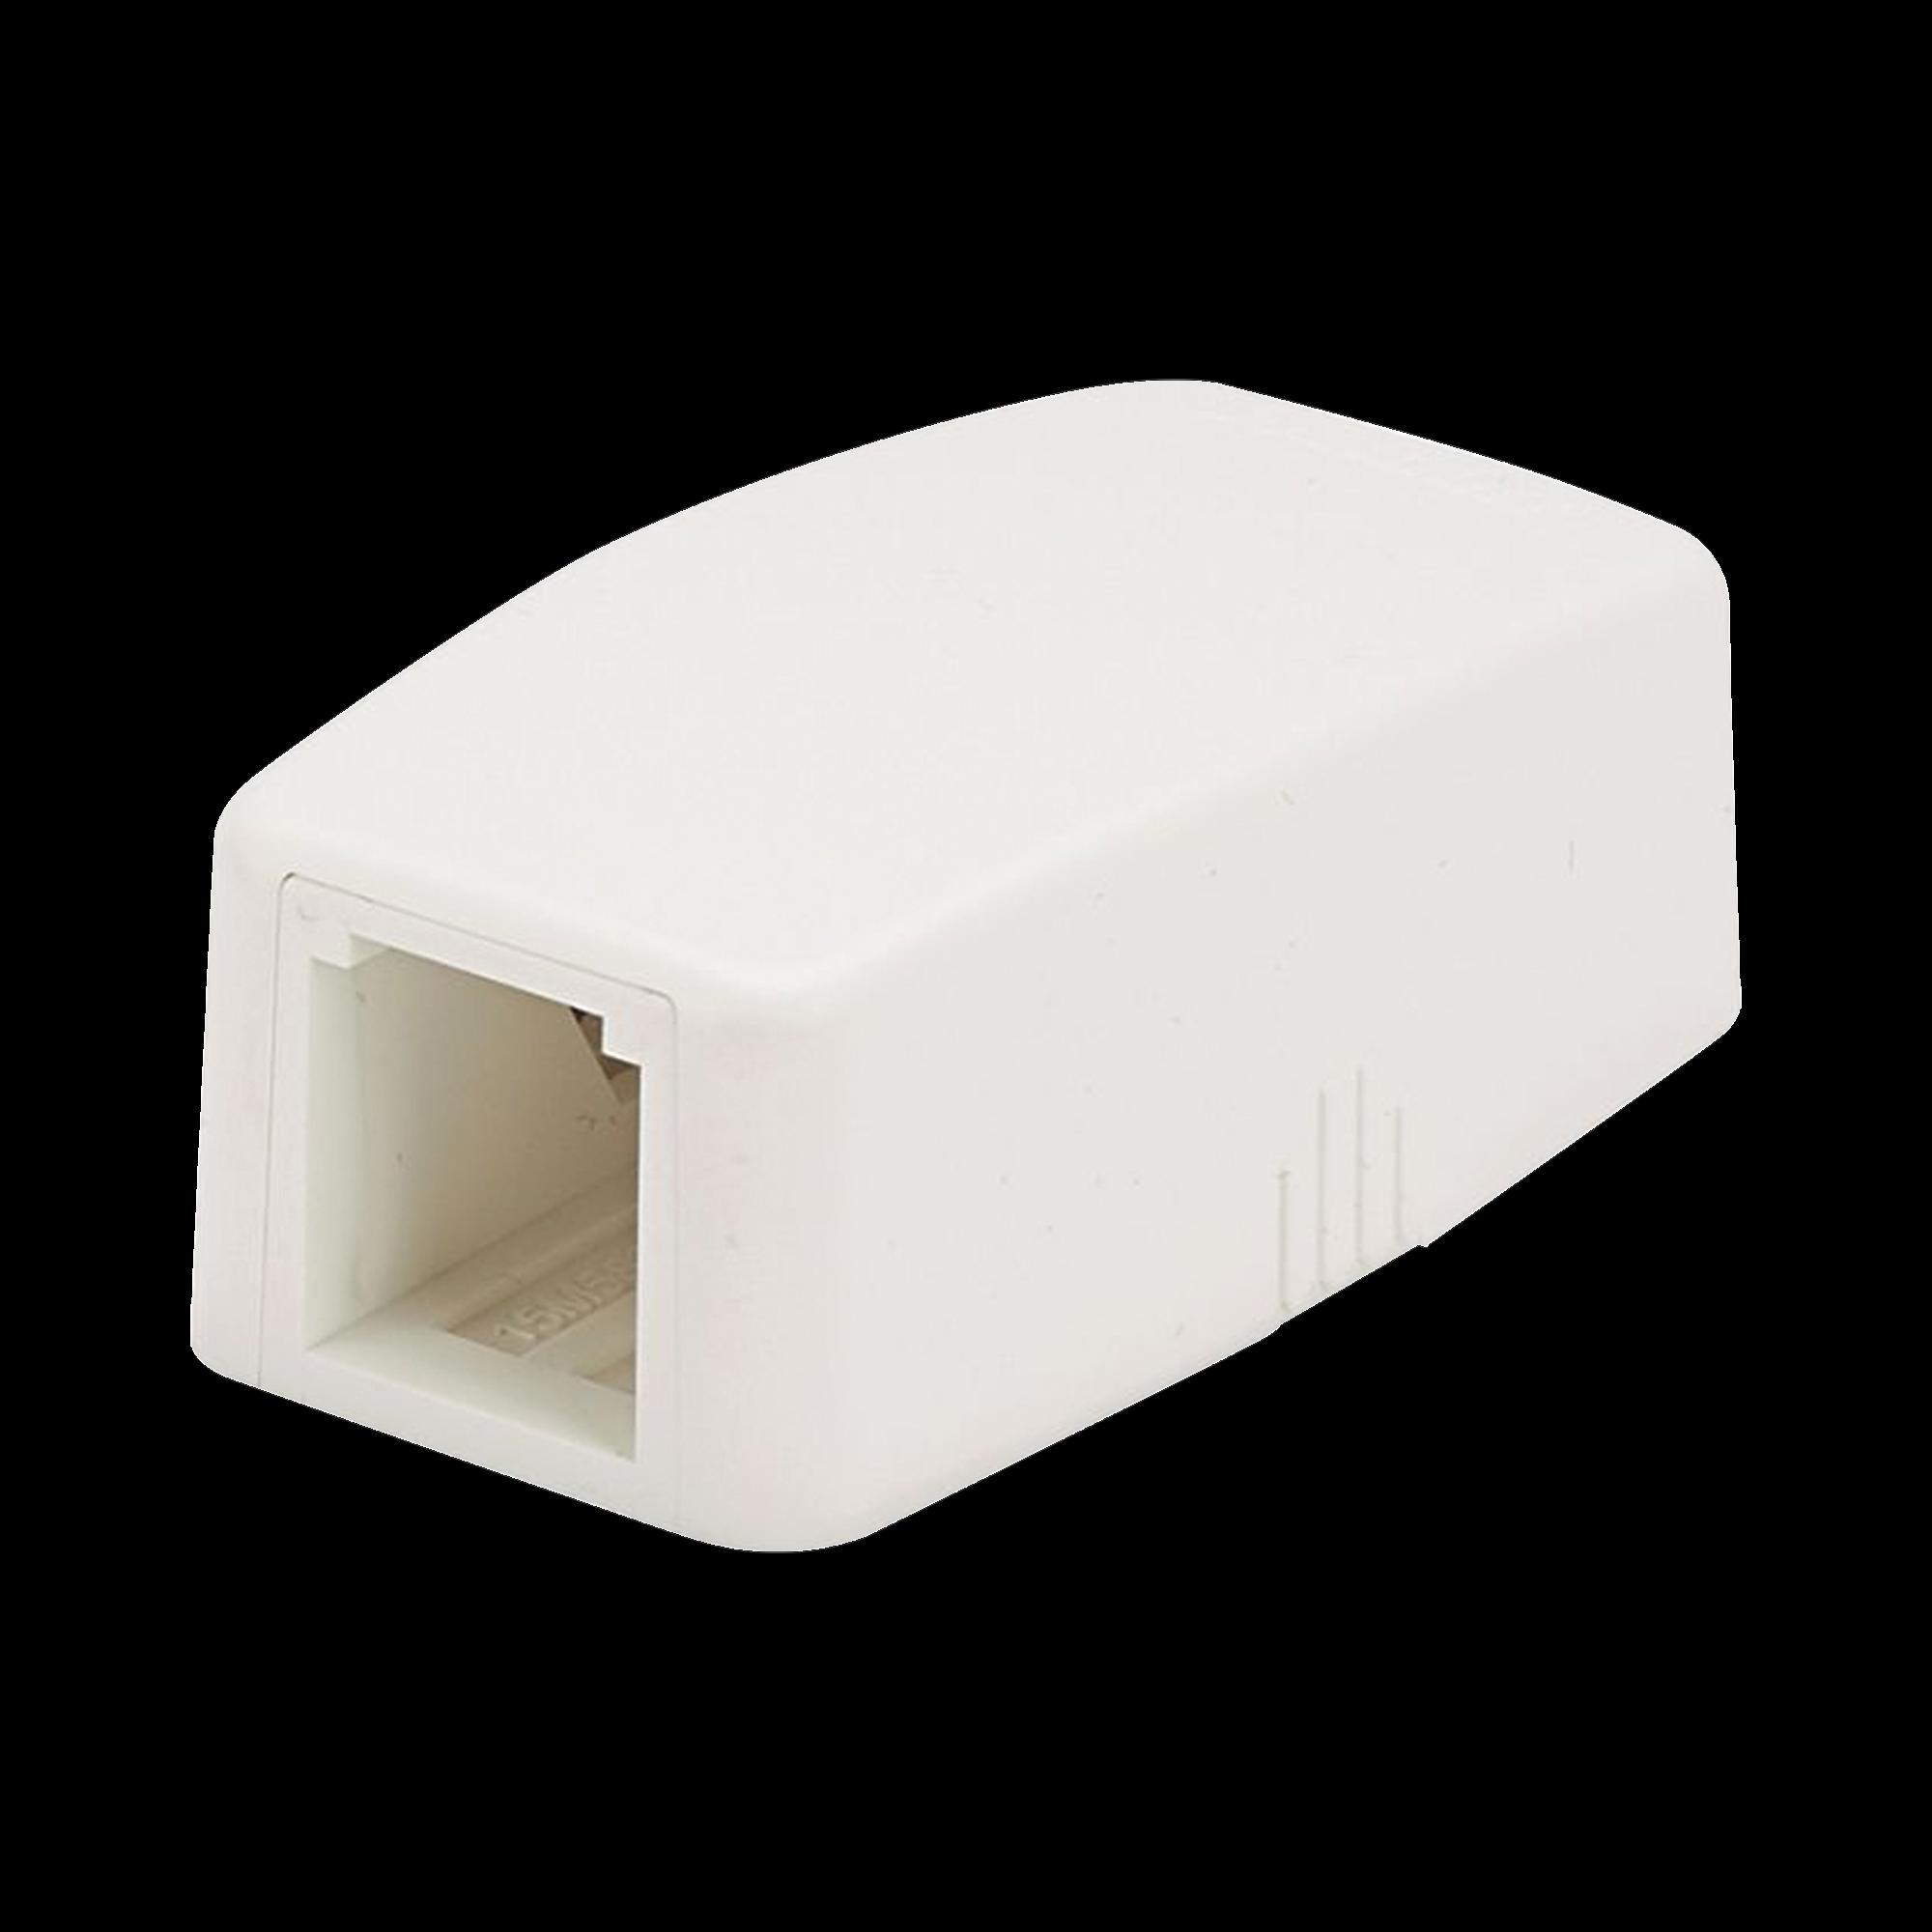 Caja de Montaje en Superficie, Para 1 Modulo Mini-Com, Color Blanco Mate